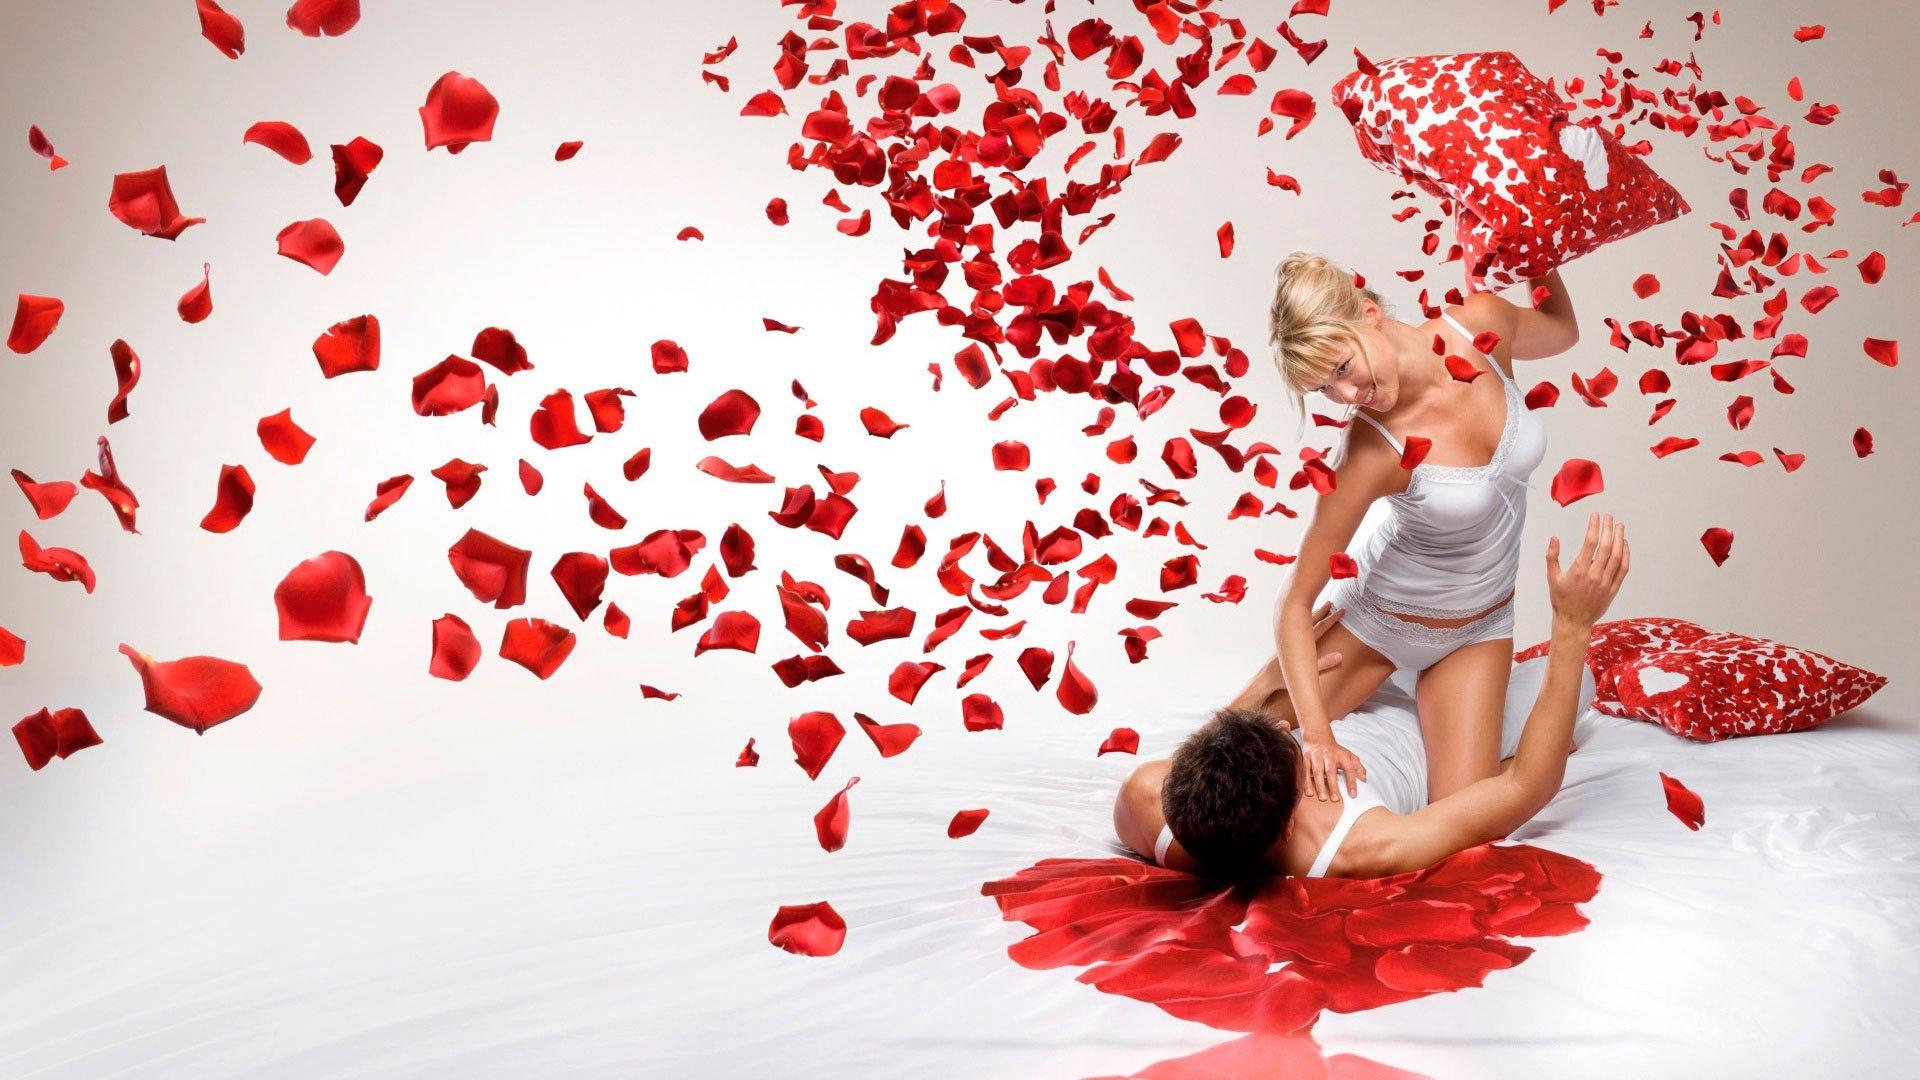 Romantic Love Wallpaper Free